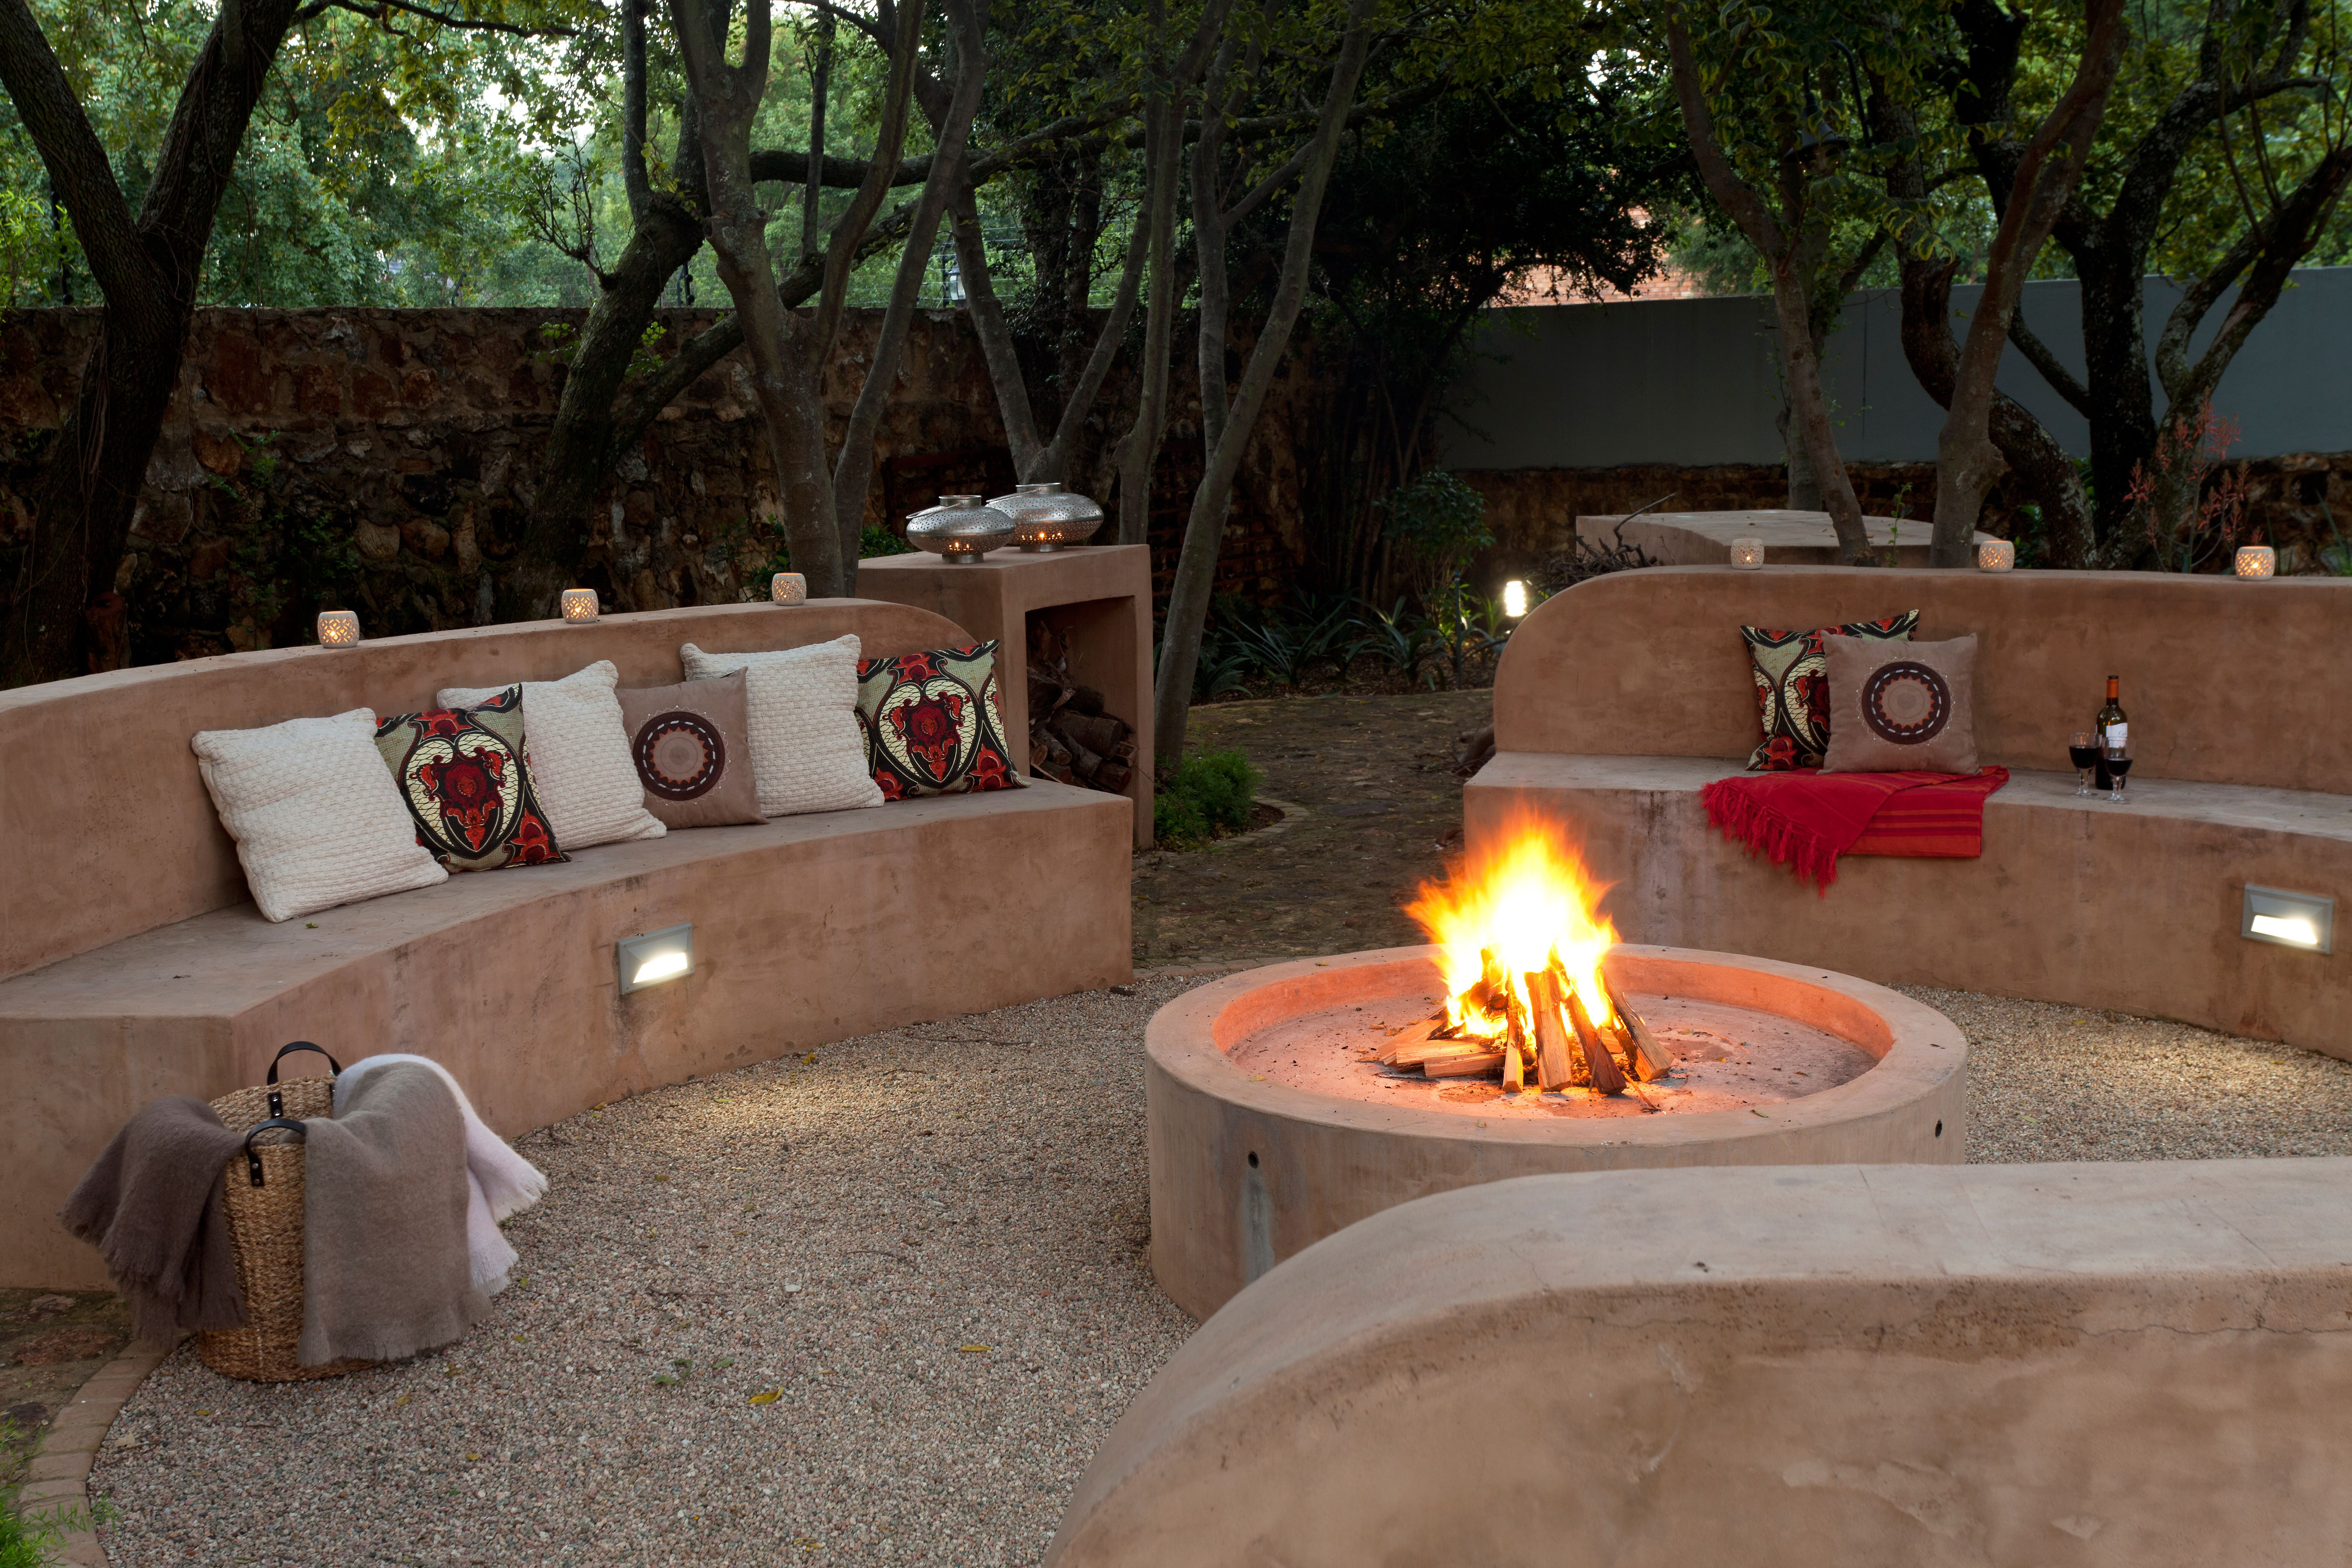 Designing a stylish boma | Outdoor dekorationen, Hinterhof ... on Modern Boma Ideas  id=85230